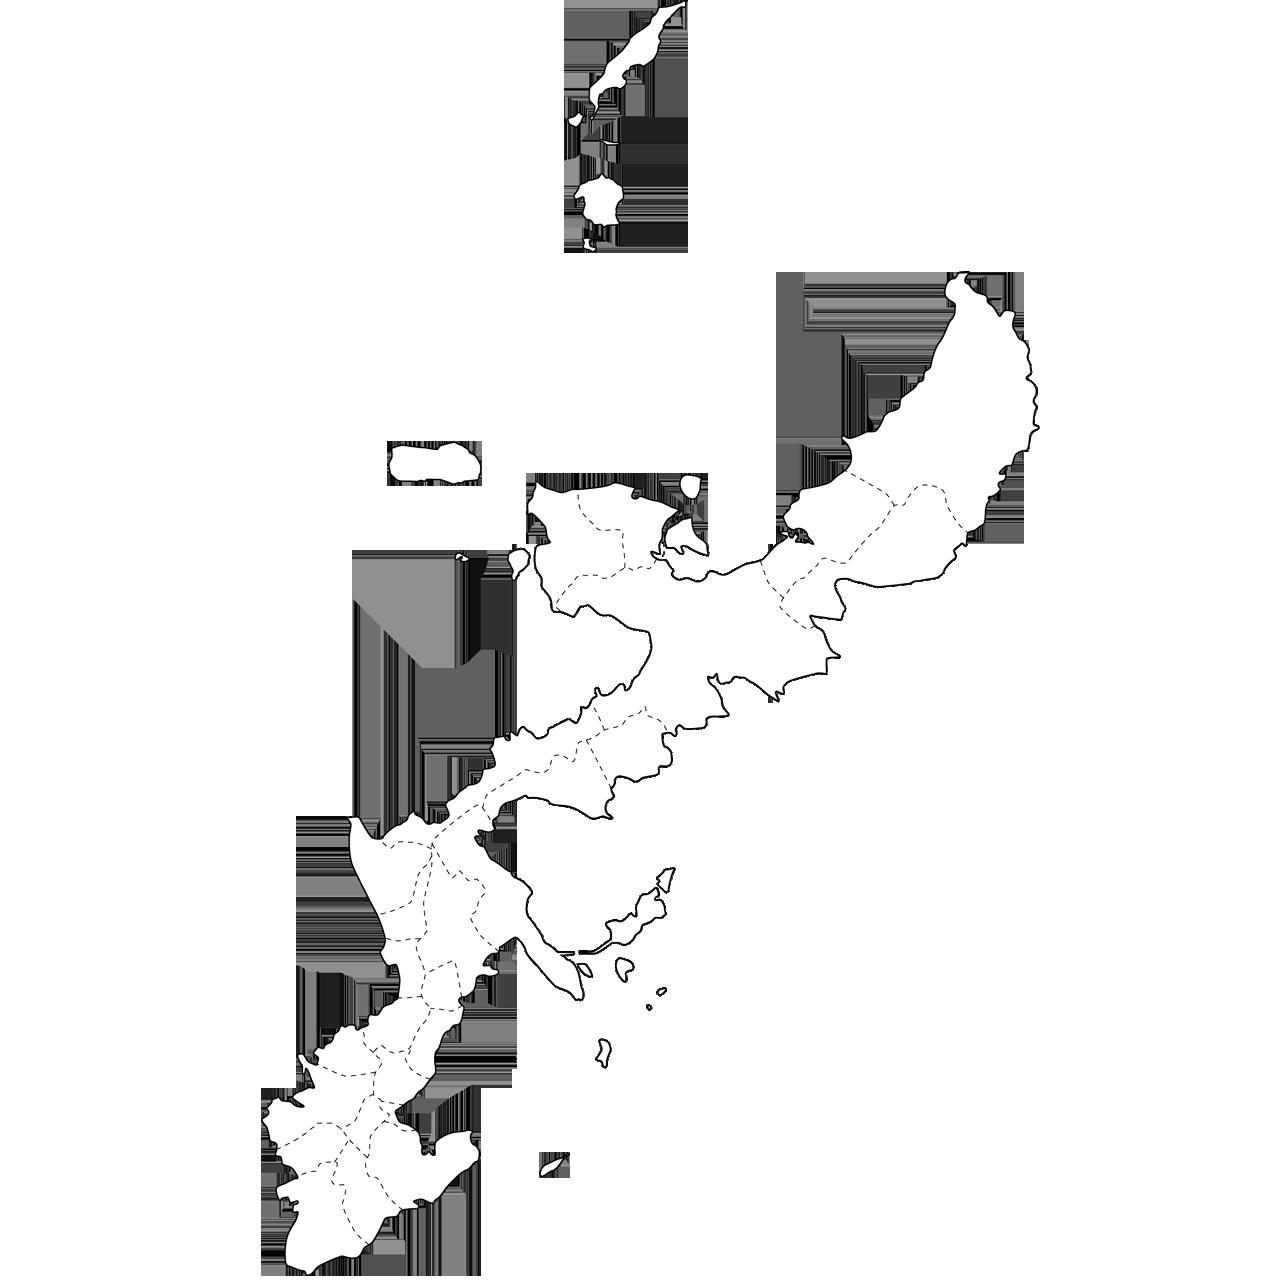 ... 沖縄県「白地図(市町村境も